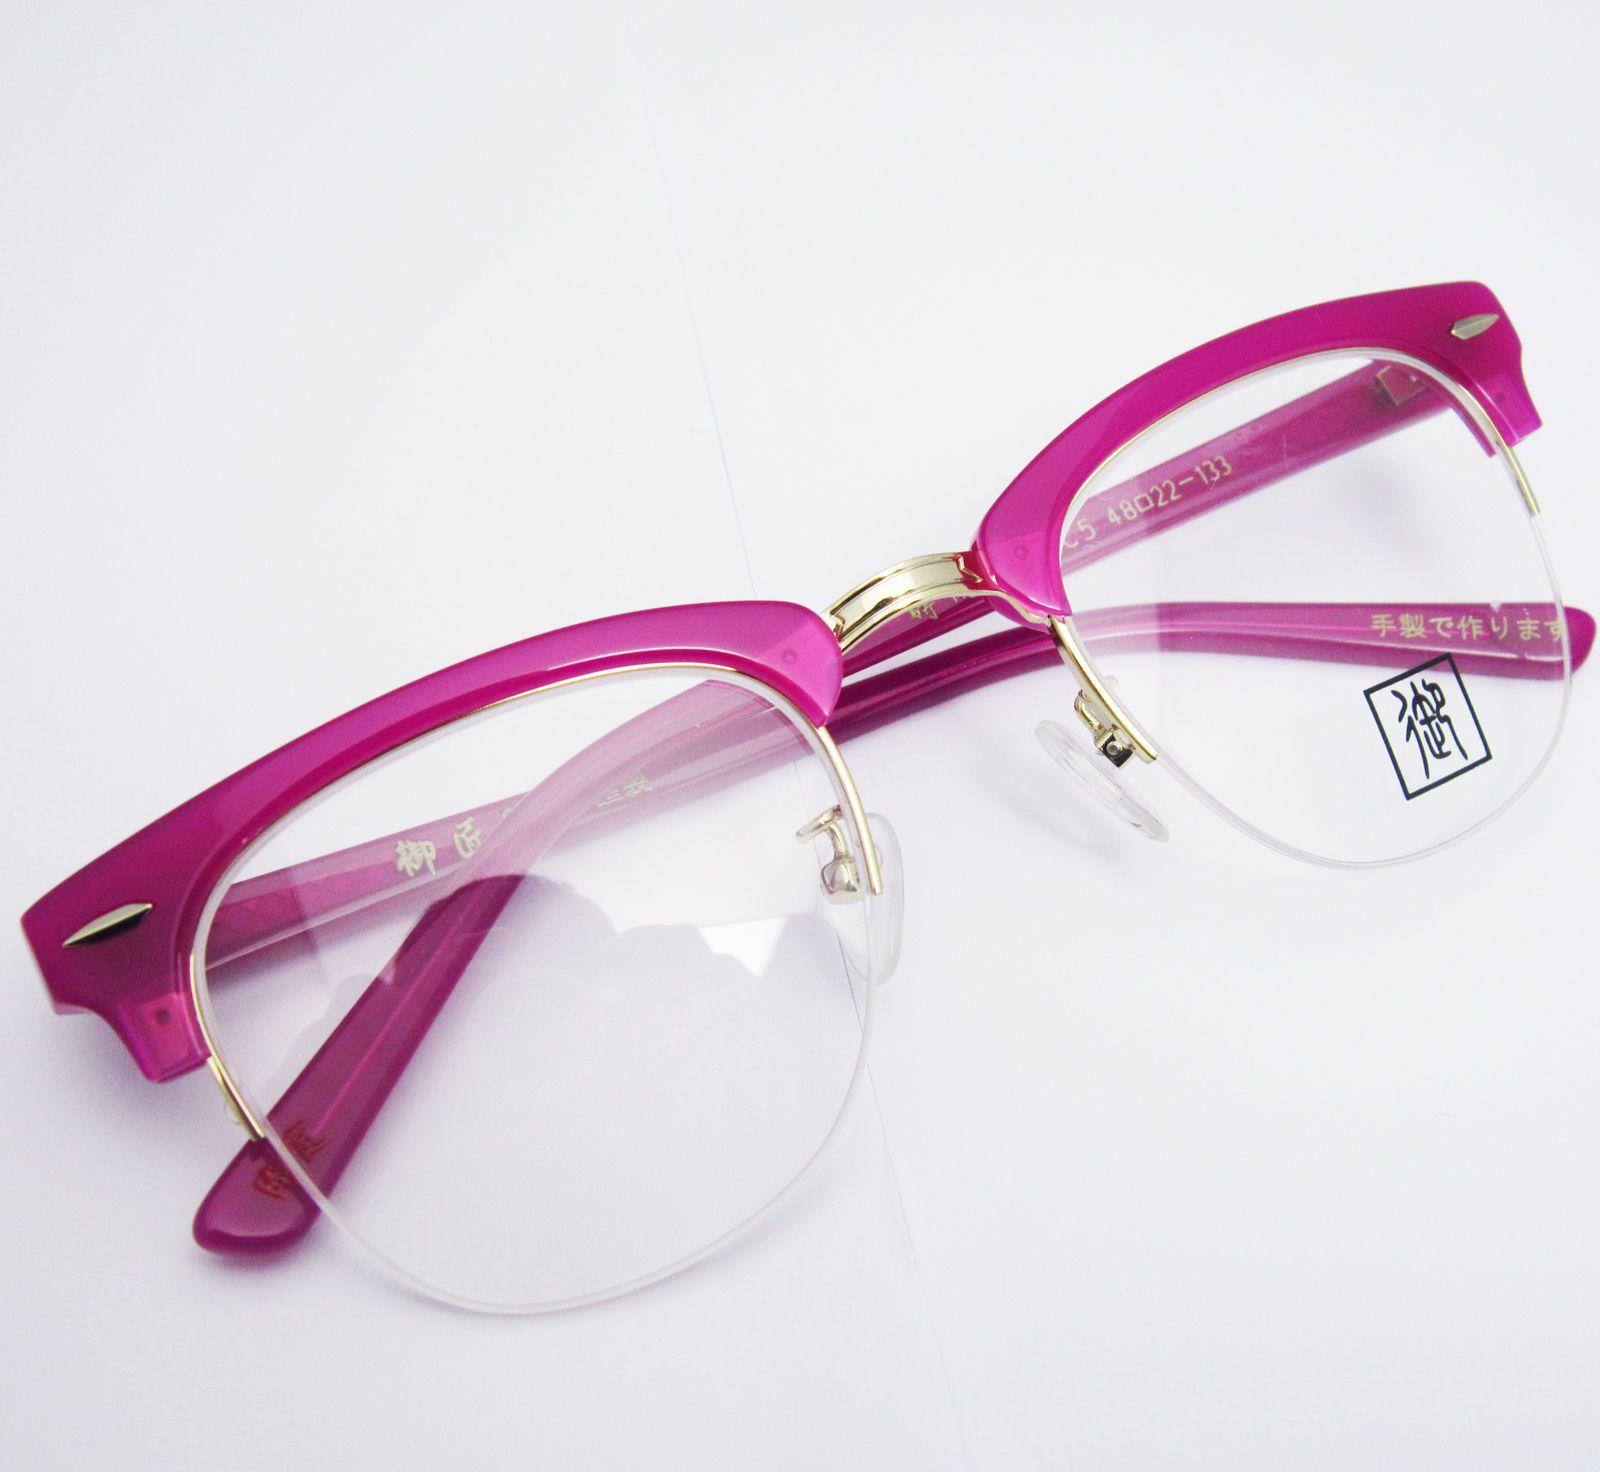 womens vintage retro brow line shurons roseo purple eyeglass frames spectacles ebay - Ebay Eyeglasses Frames